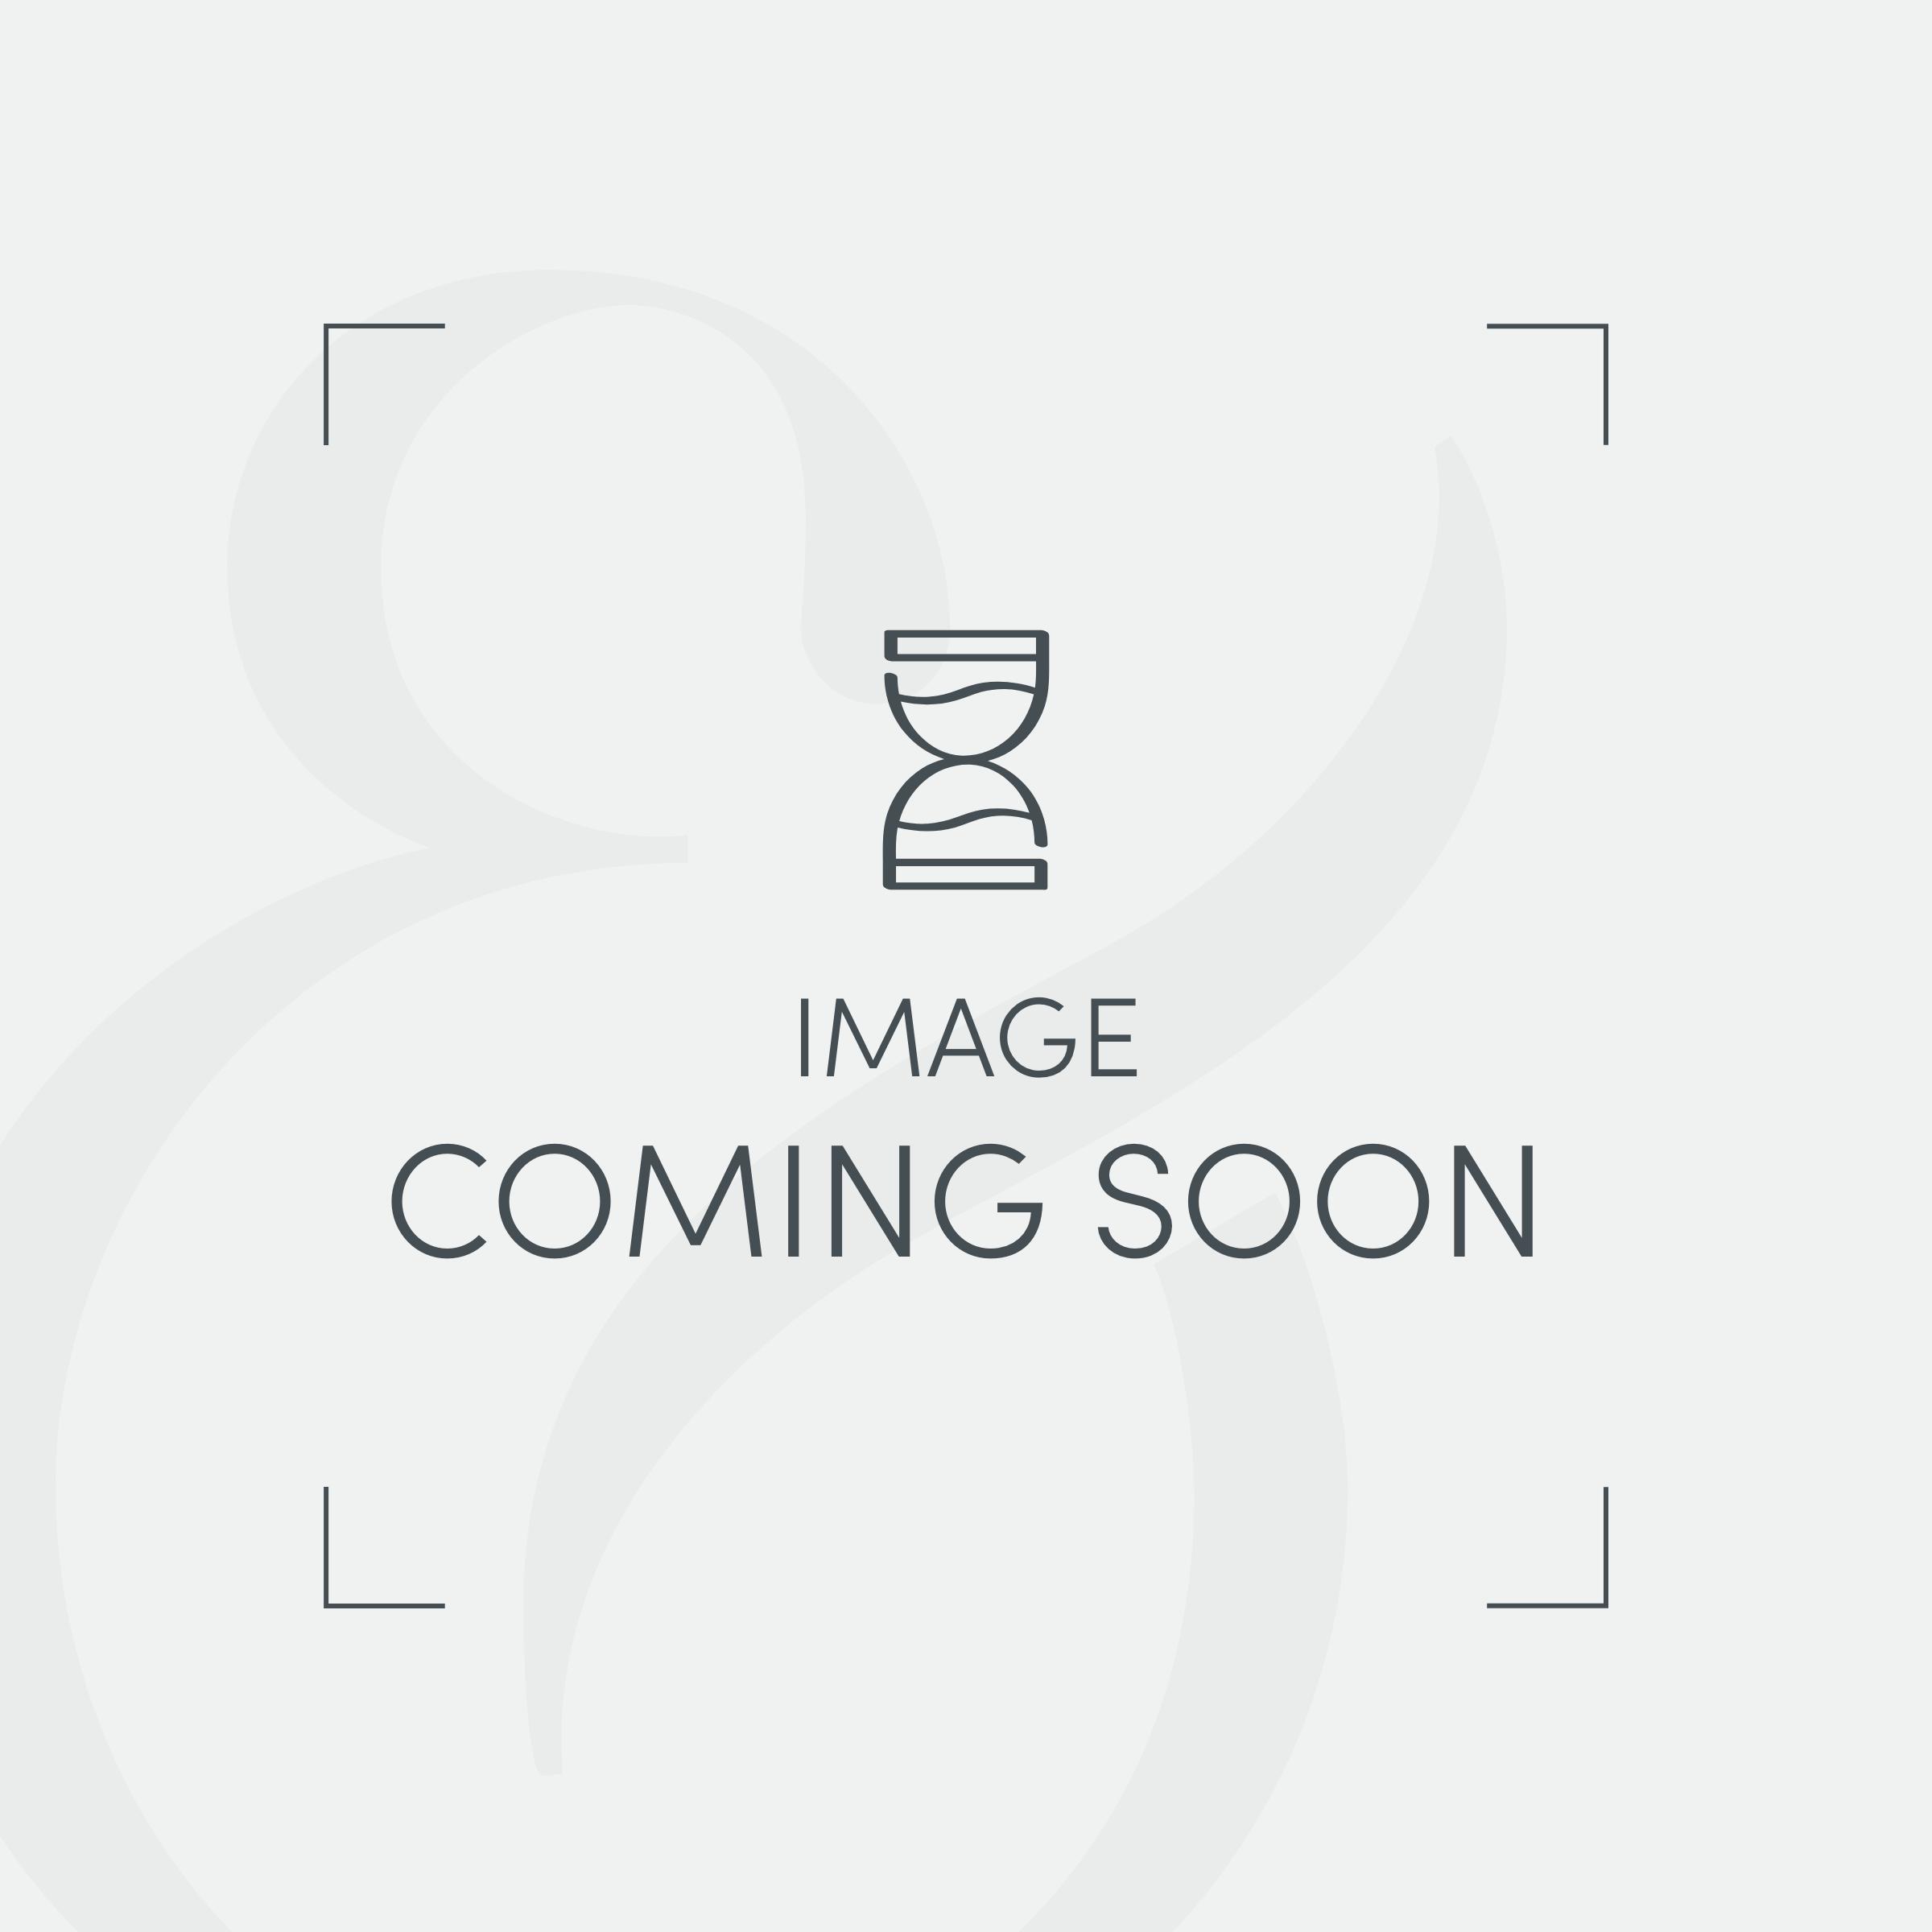 100% Natural Hemp Bundle - Chalk - Single (Duvet Cover, Standard Fitted Sheet, Standard Oxford Pillowcase Pair)